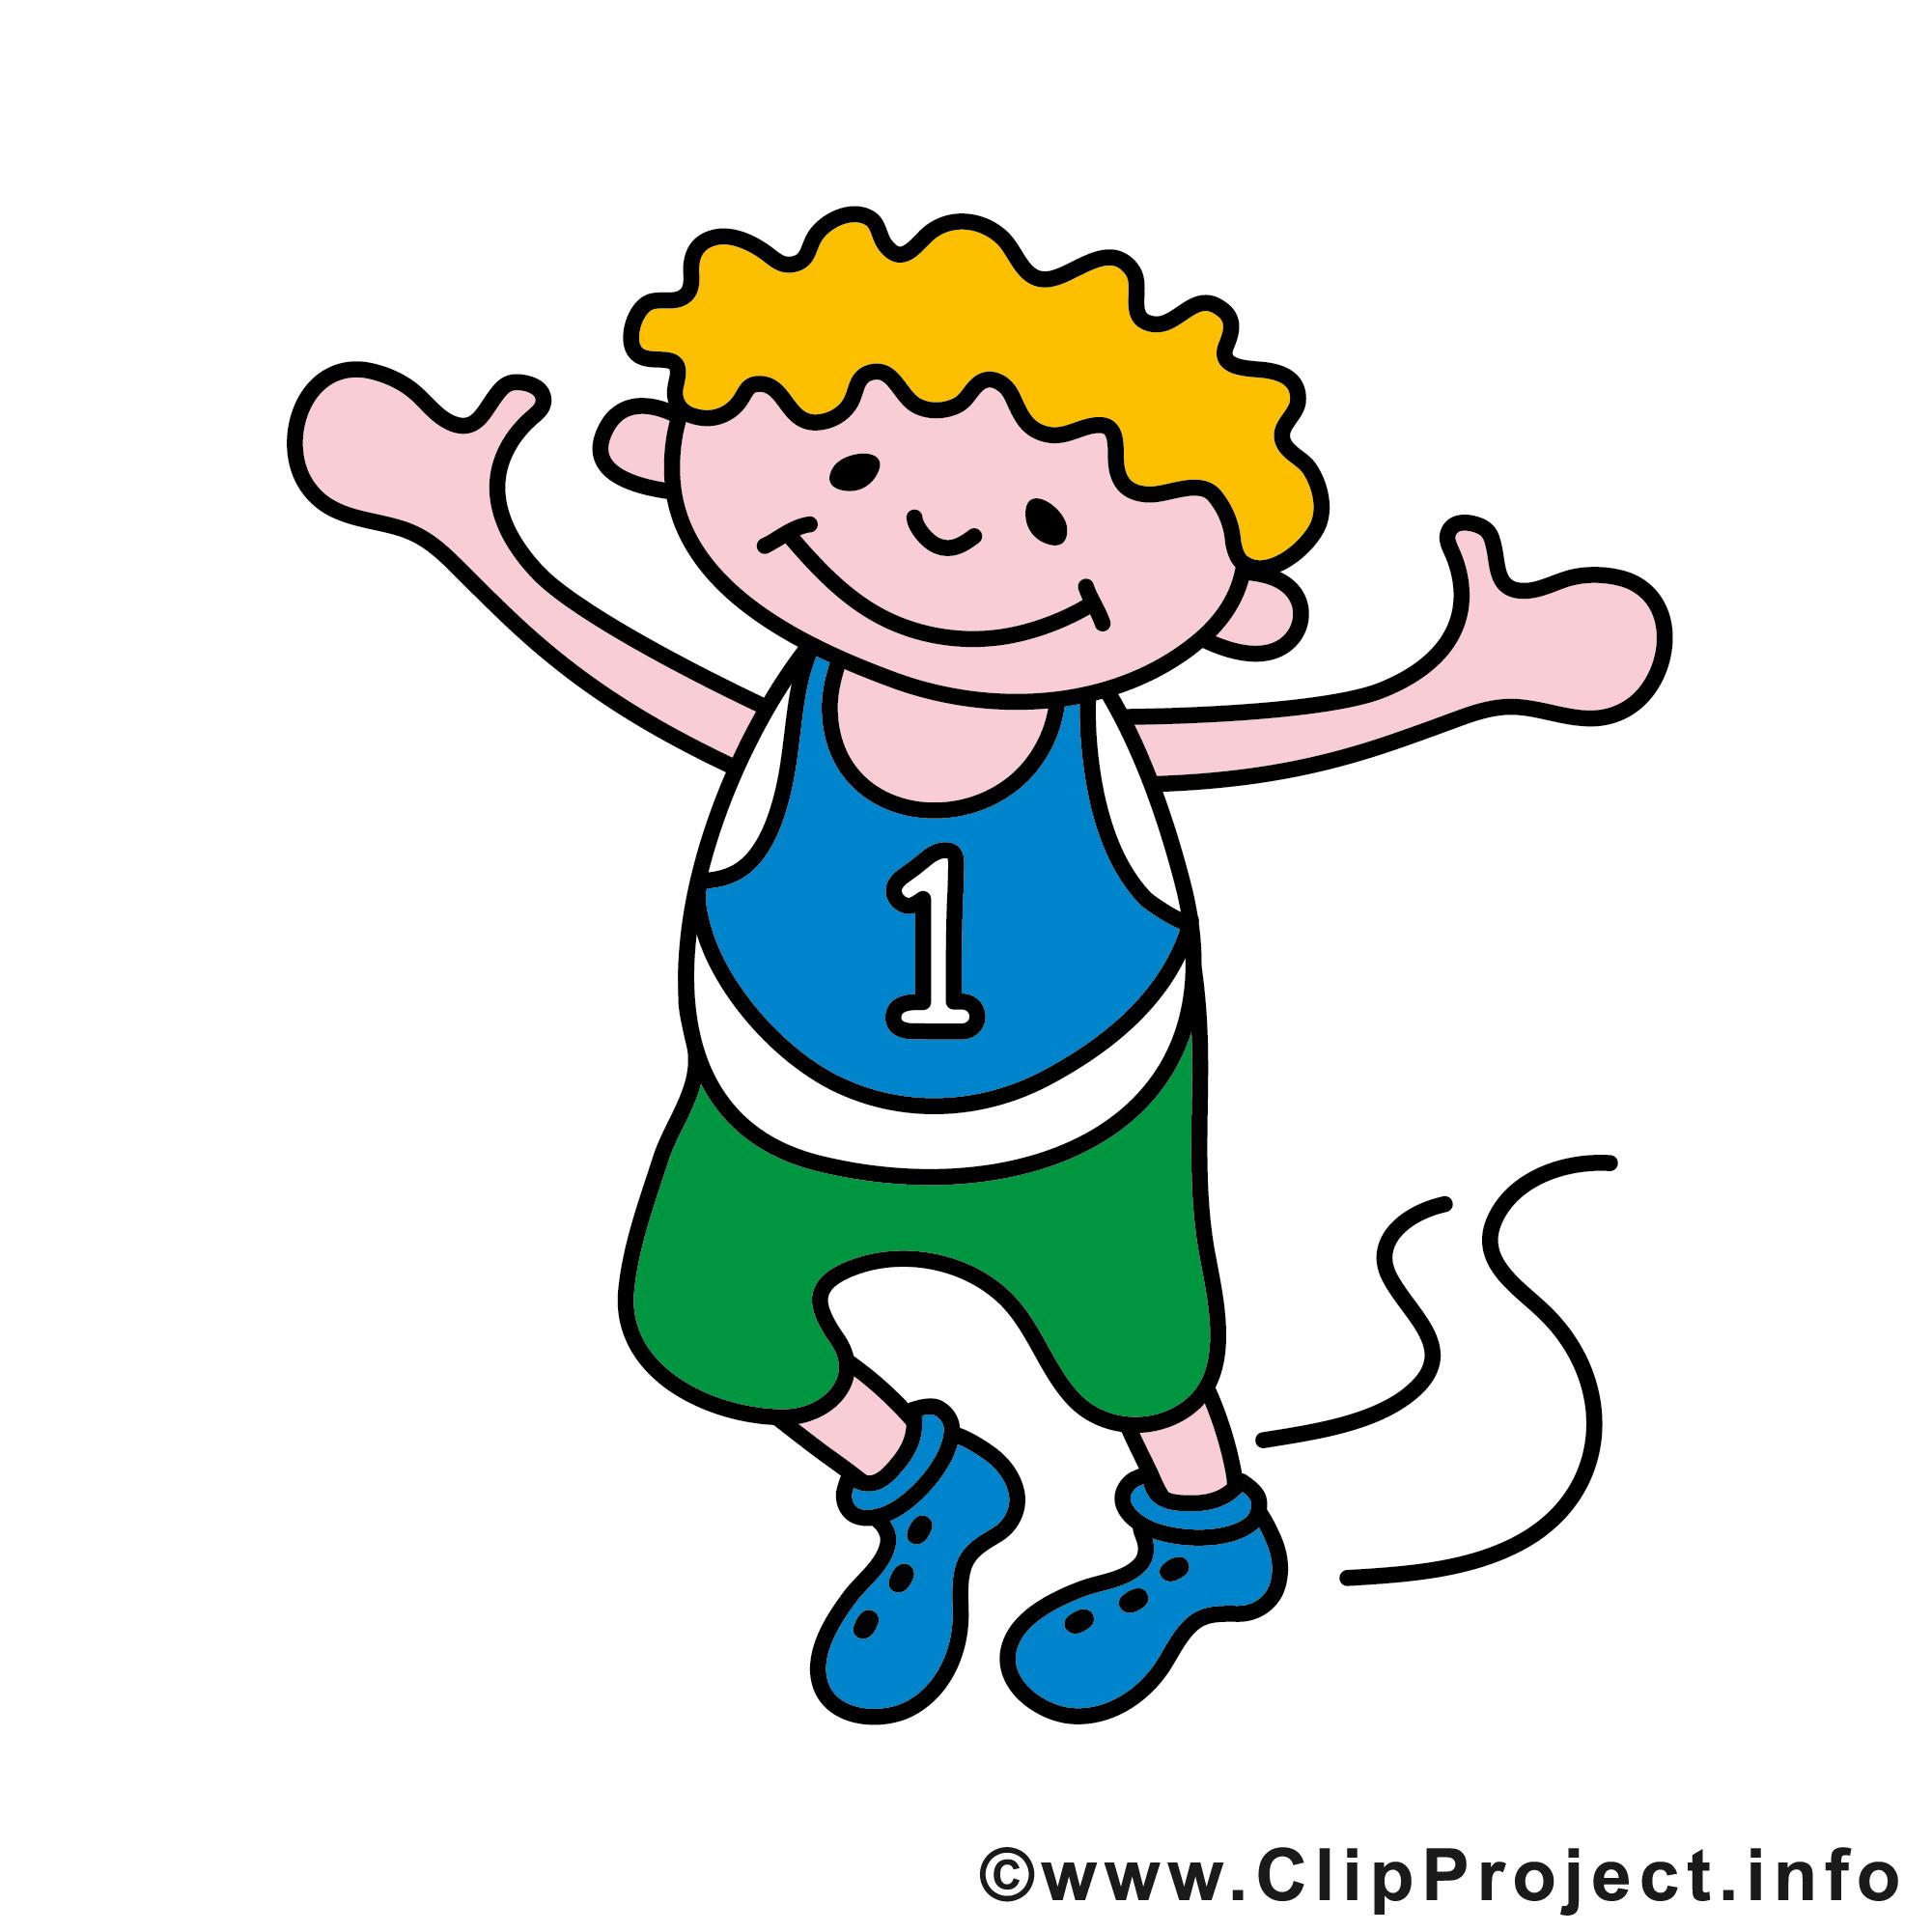 2001x2001 Kind Clipart Free Clip Art Children Reading Booksjpg1342 X 1600